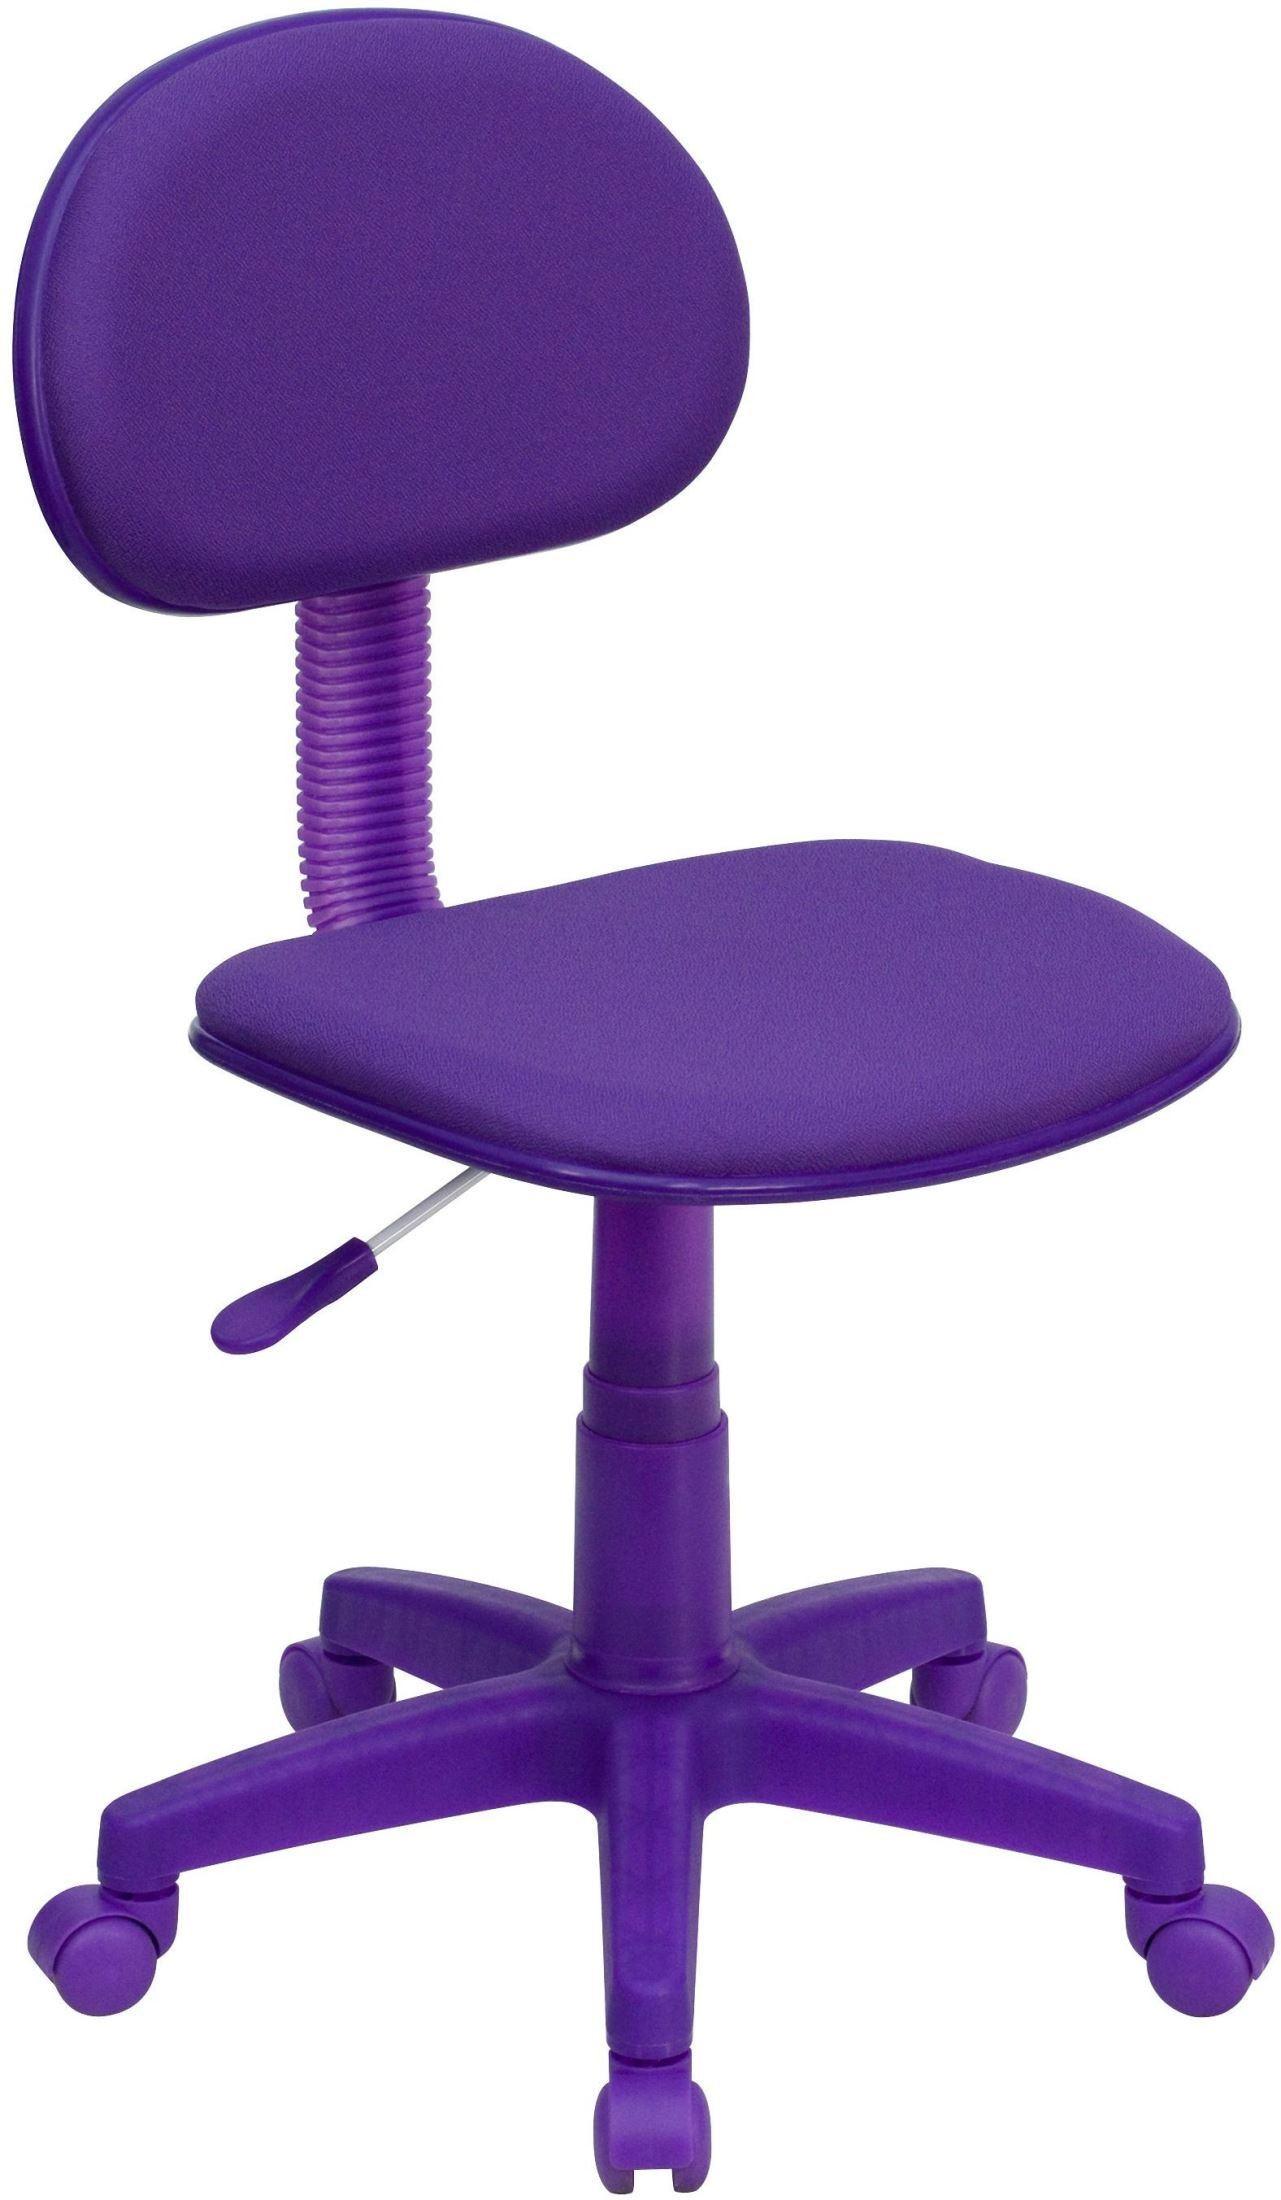 purple task chair galvanized metal ergonomic pneumatic seat height